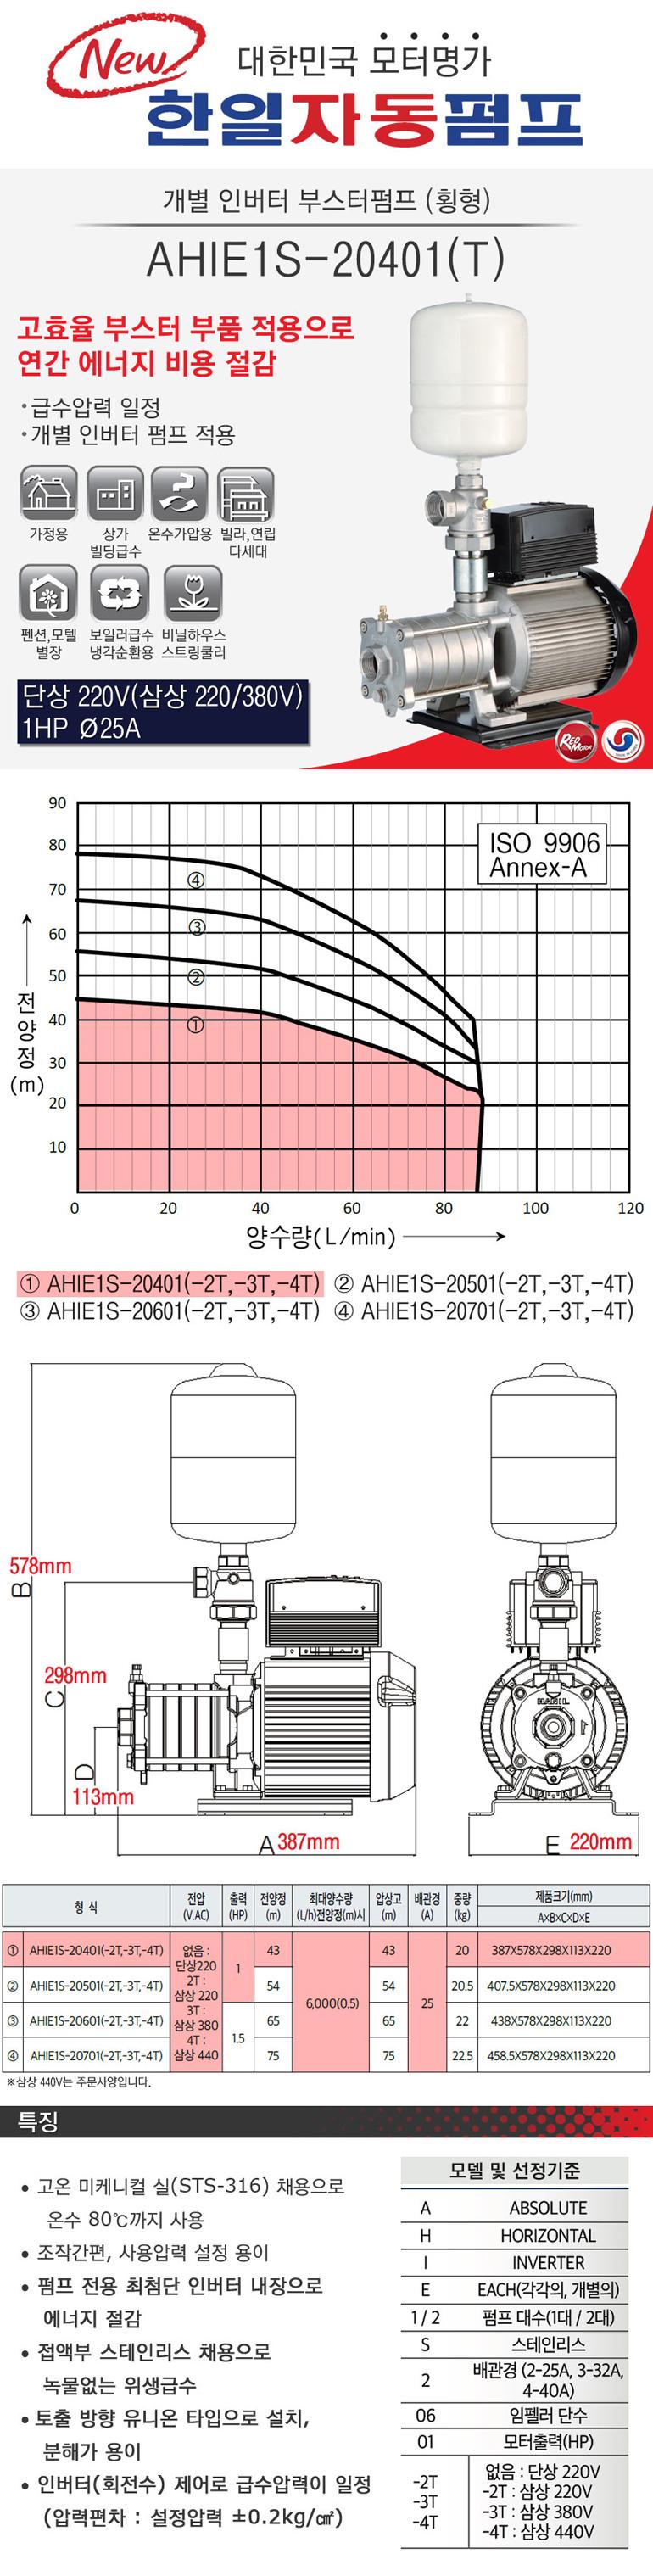 AHIE1S-20401